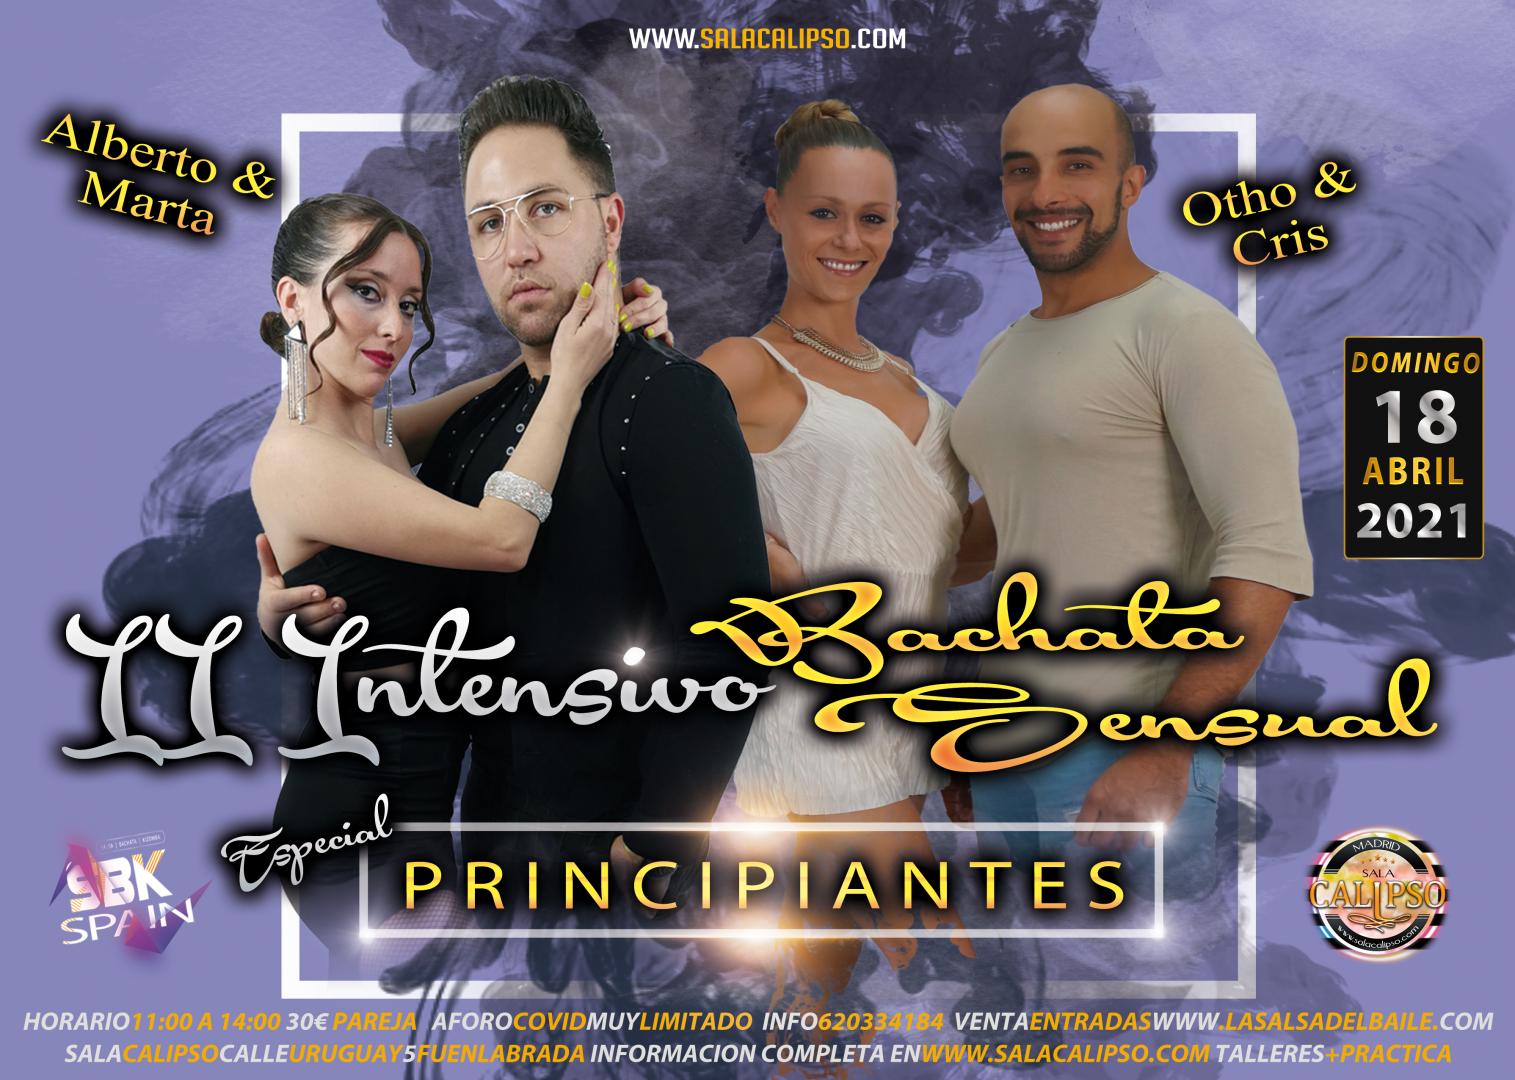 Intensivo Bachata Sensual para PRINCIPIANTES Dom18Abril2021